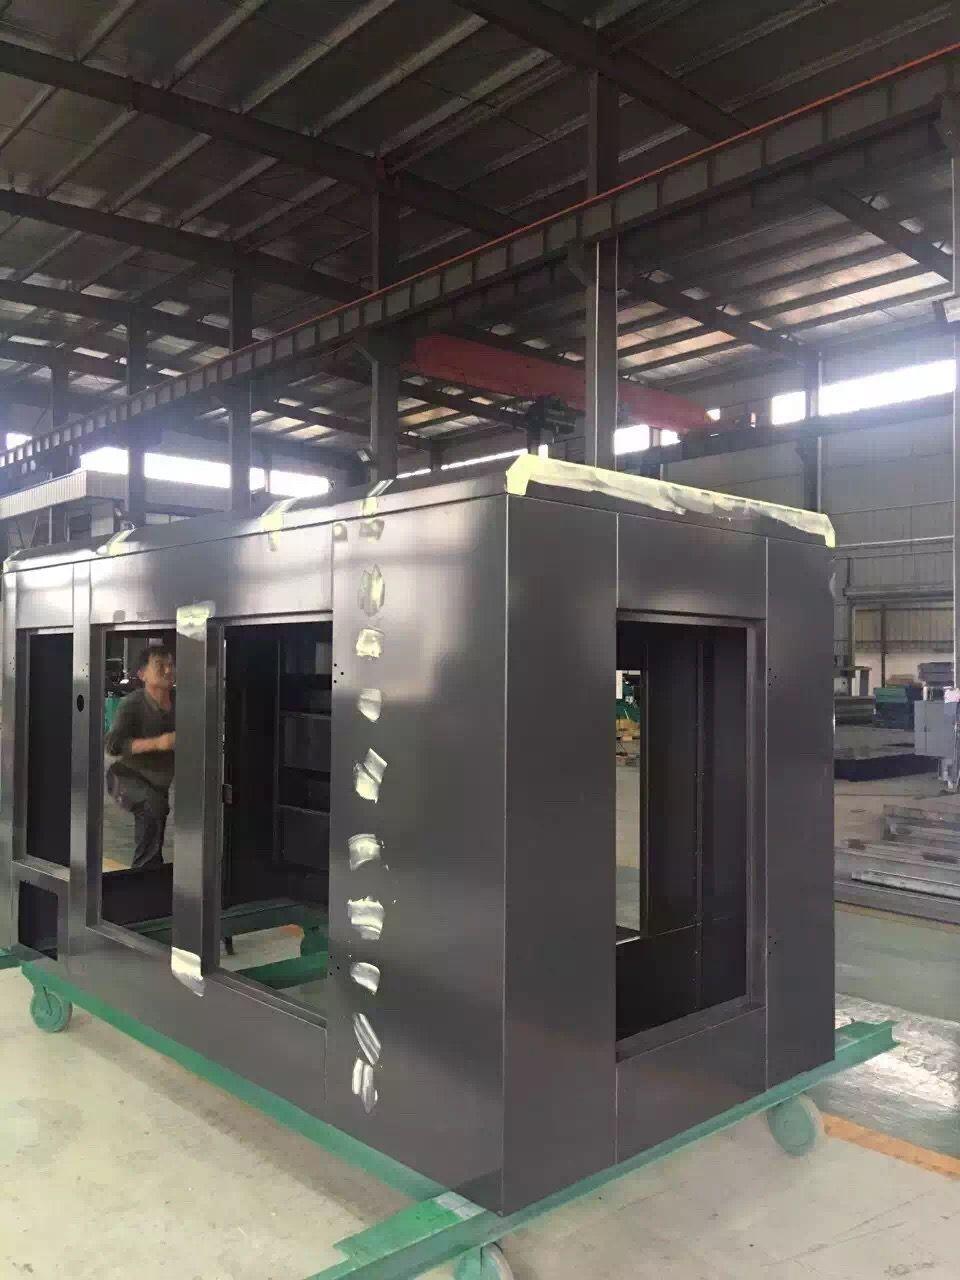 soundproof enclosure Gas generator, Sound proofing